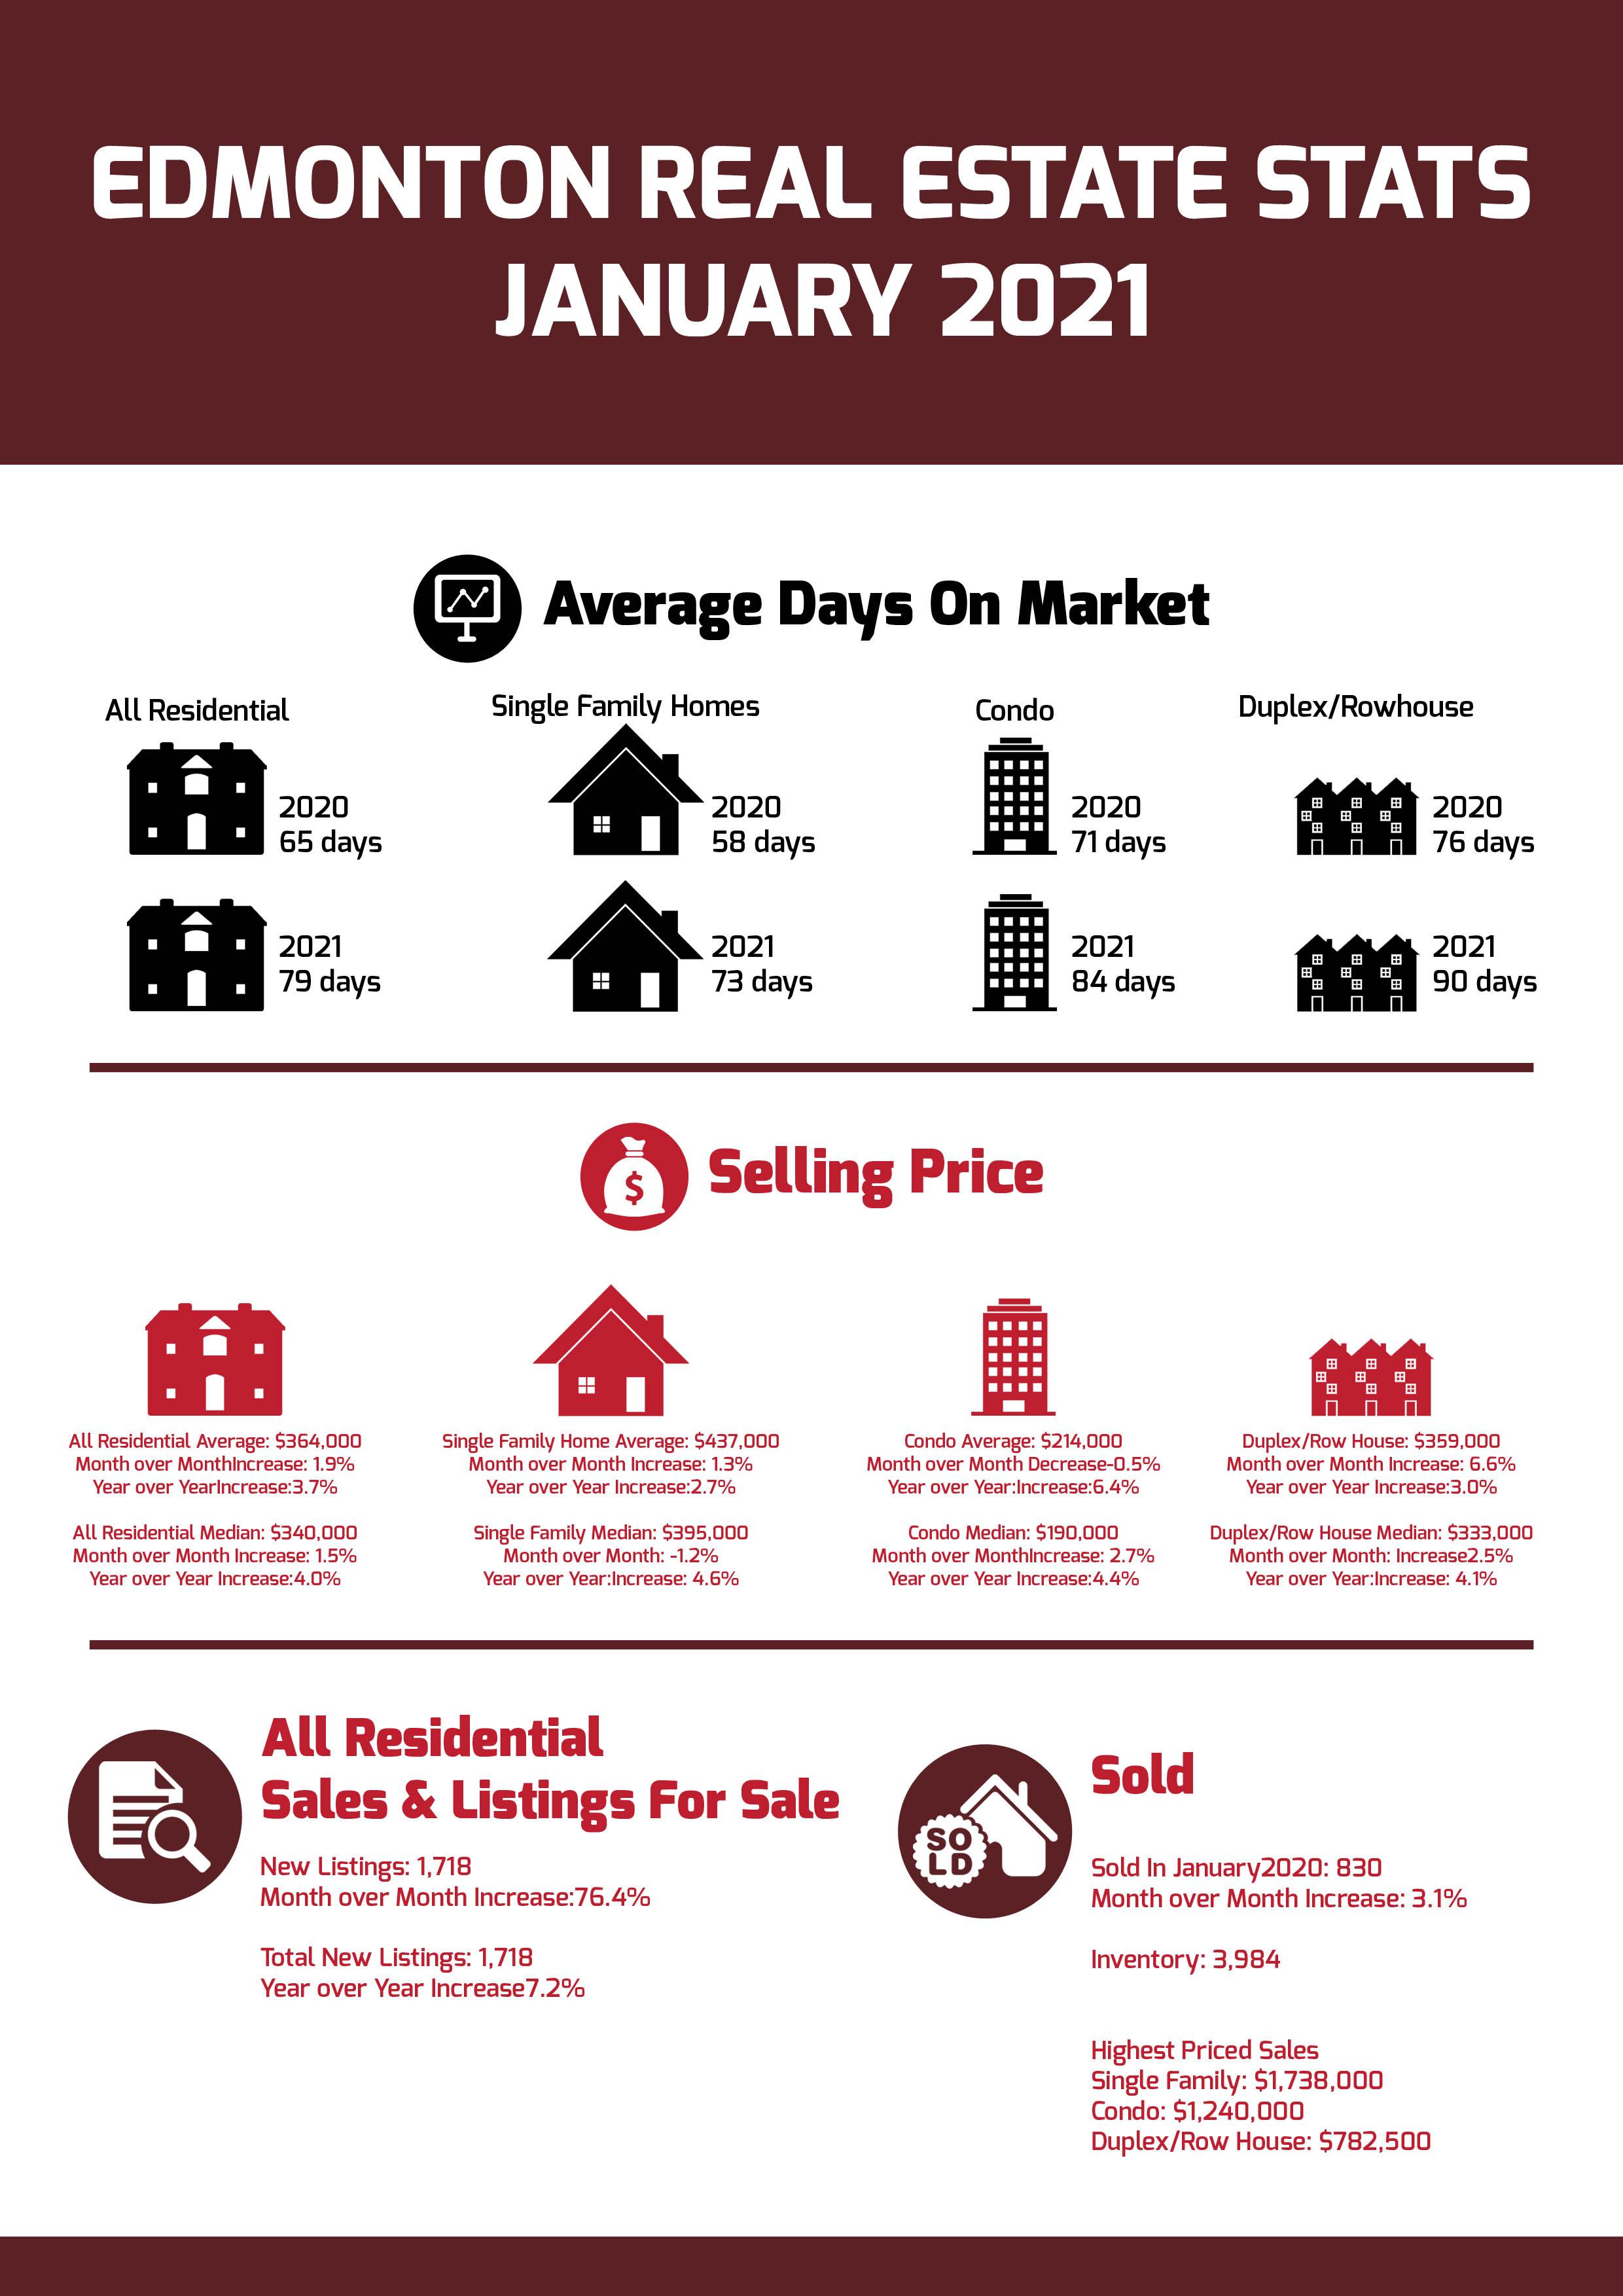 Edmonton Real Estate Stats January 2021